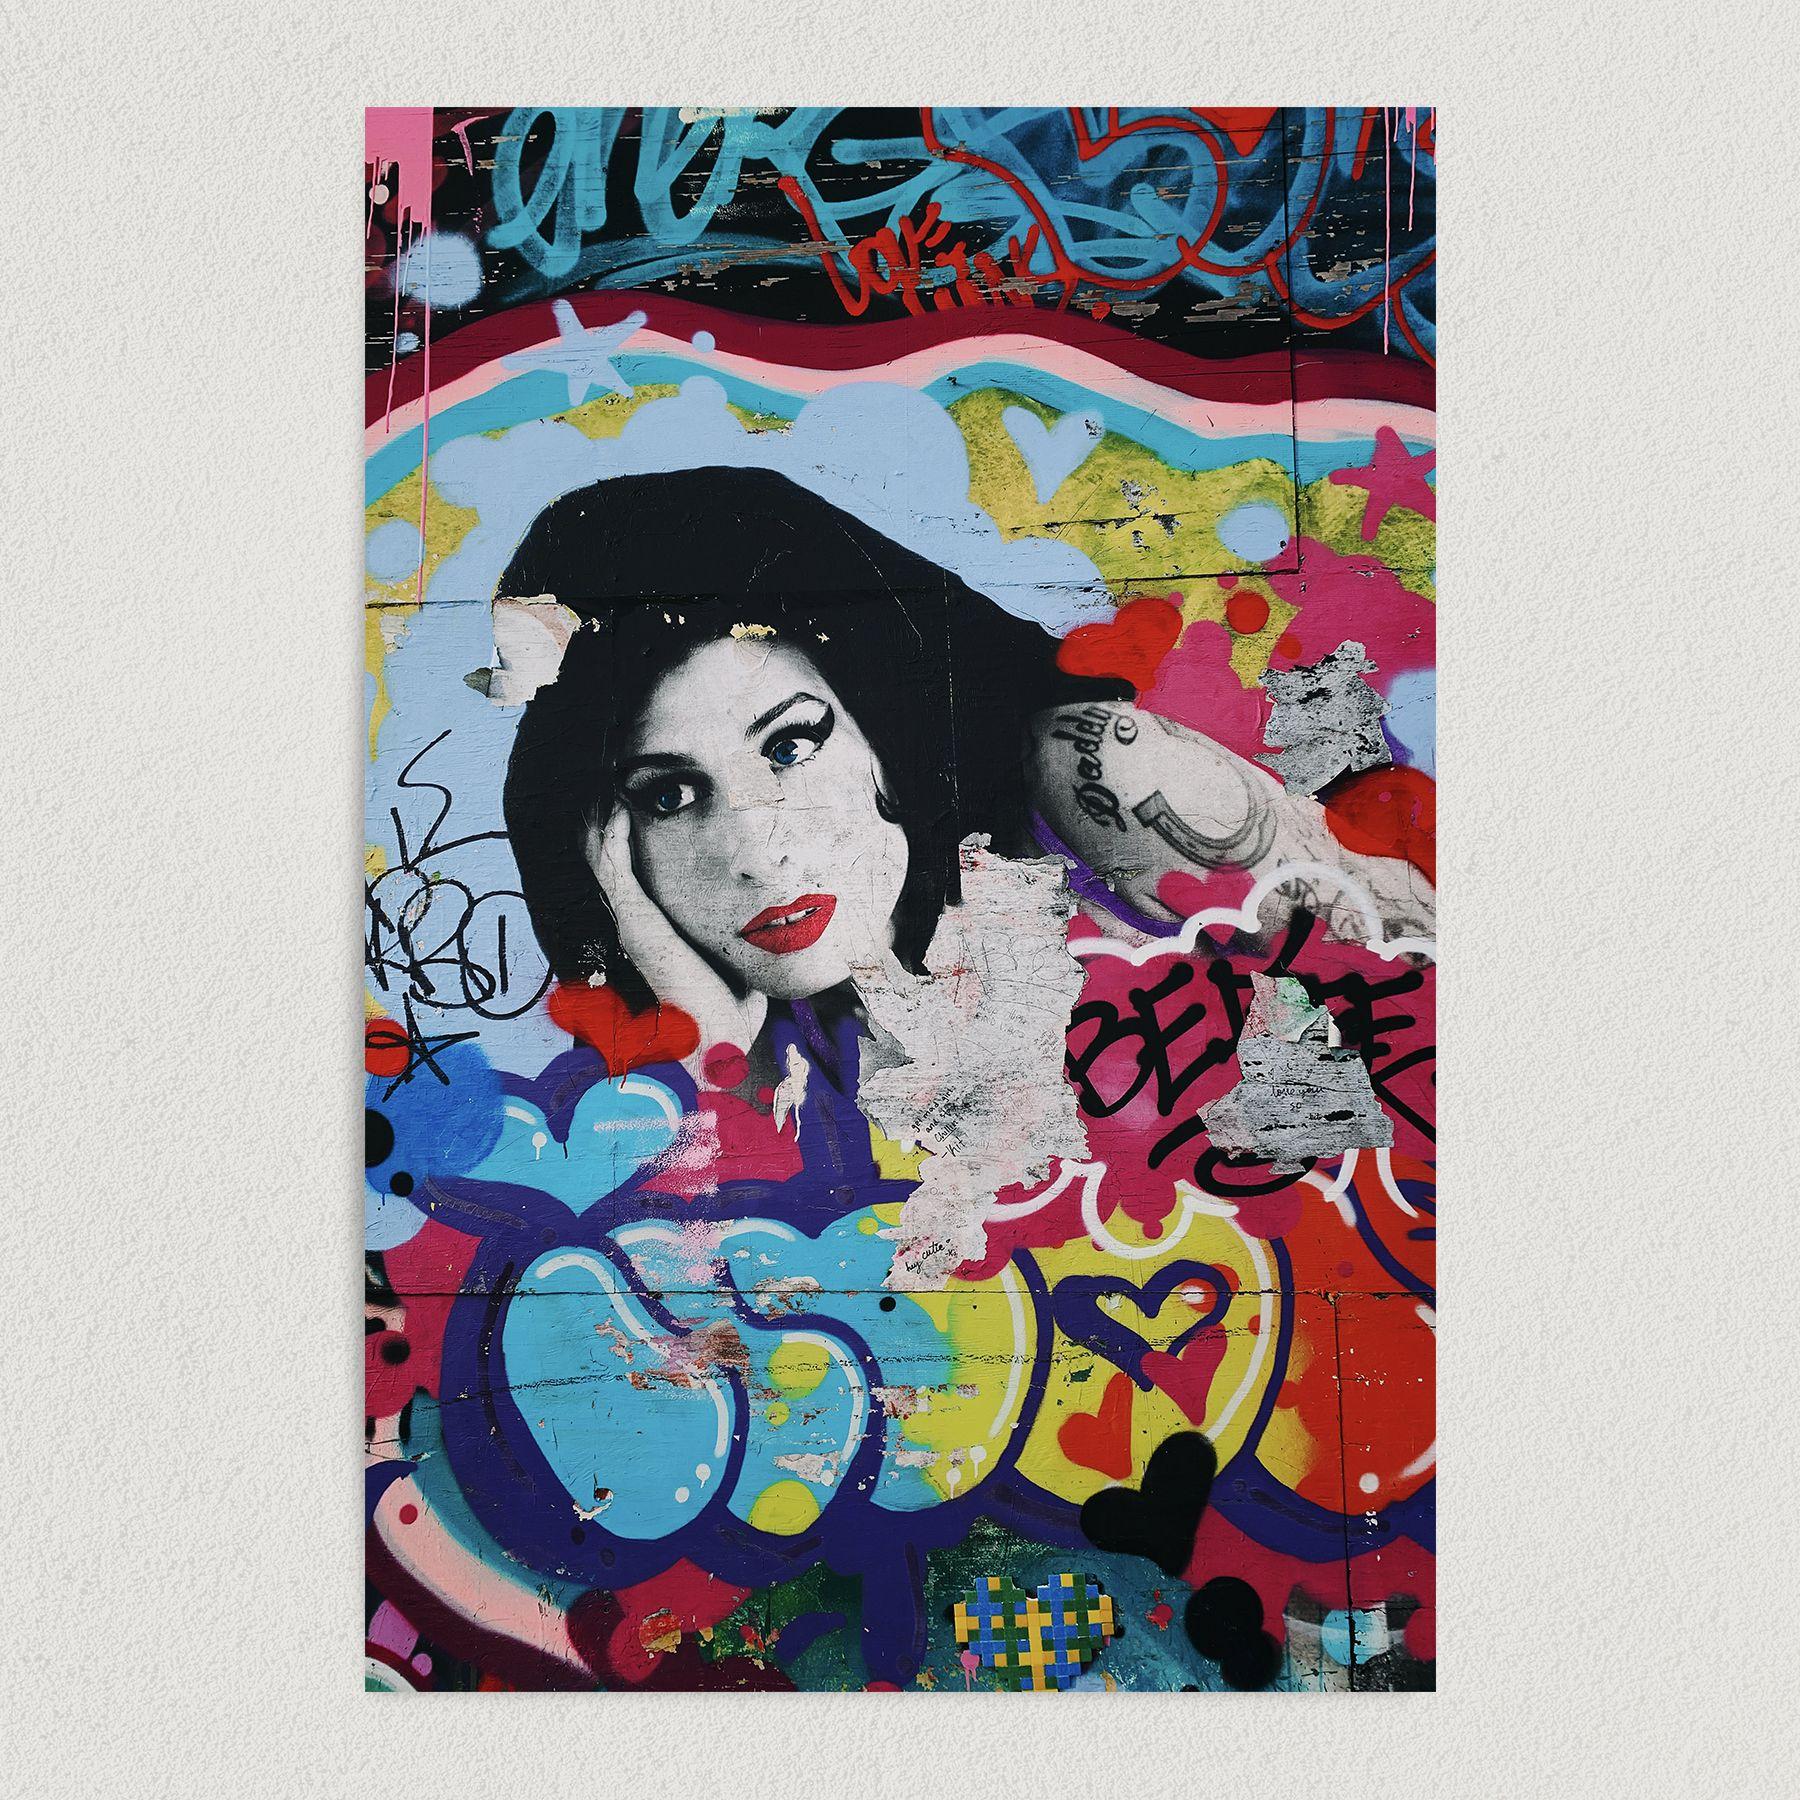 Amy Winehouse Graffiti Art Print Poster 12″ x 18″ Wall Art FP3172